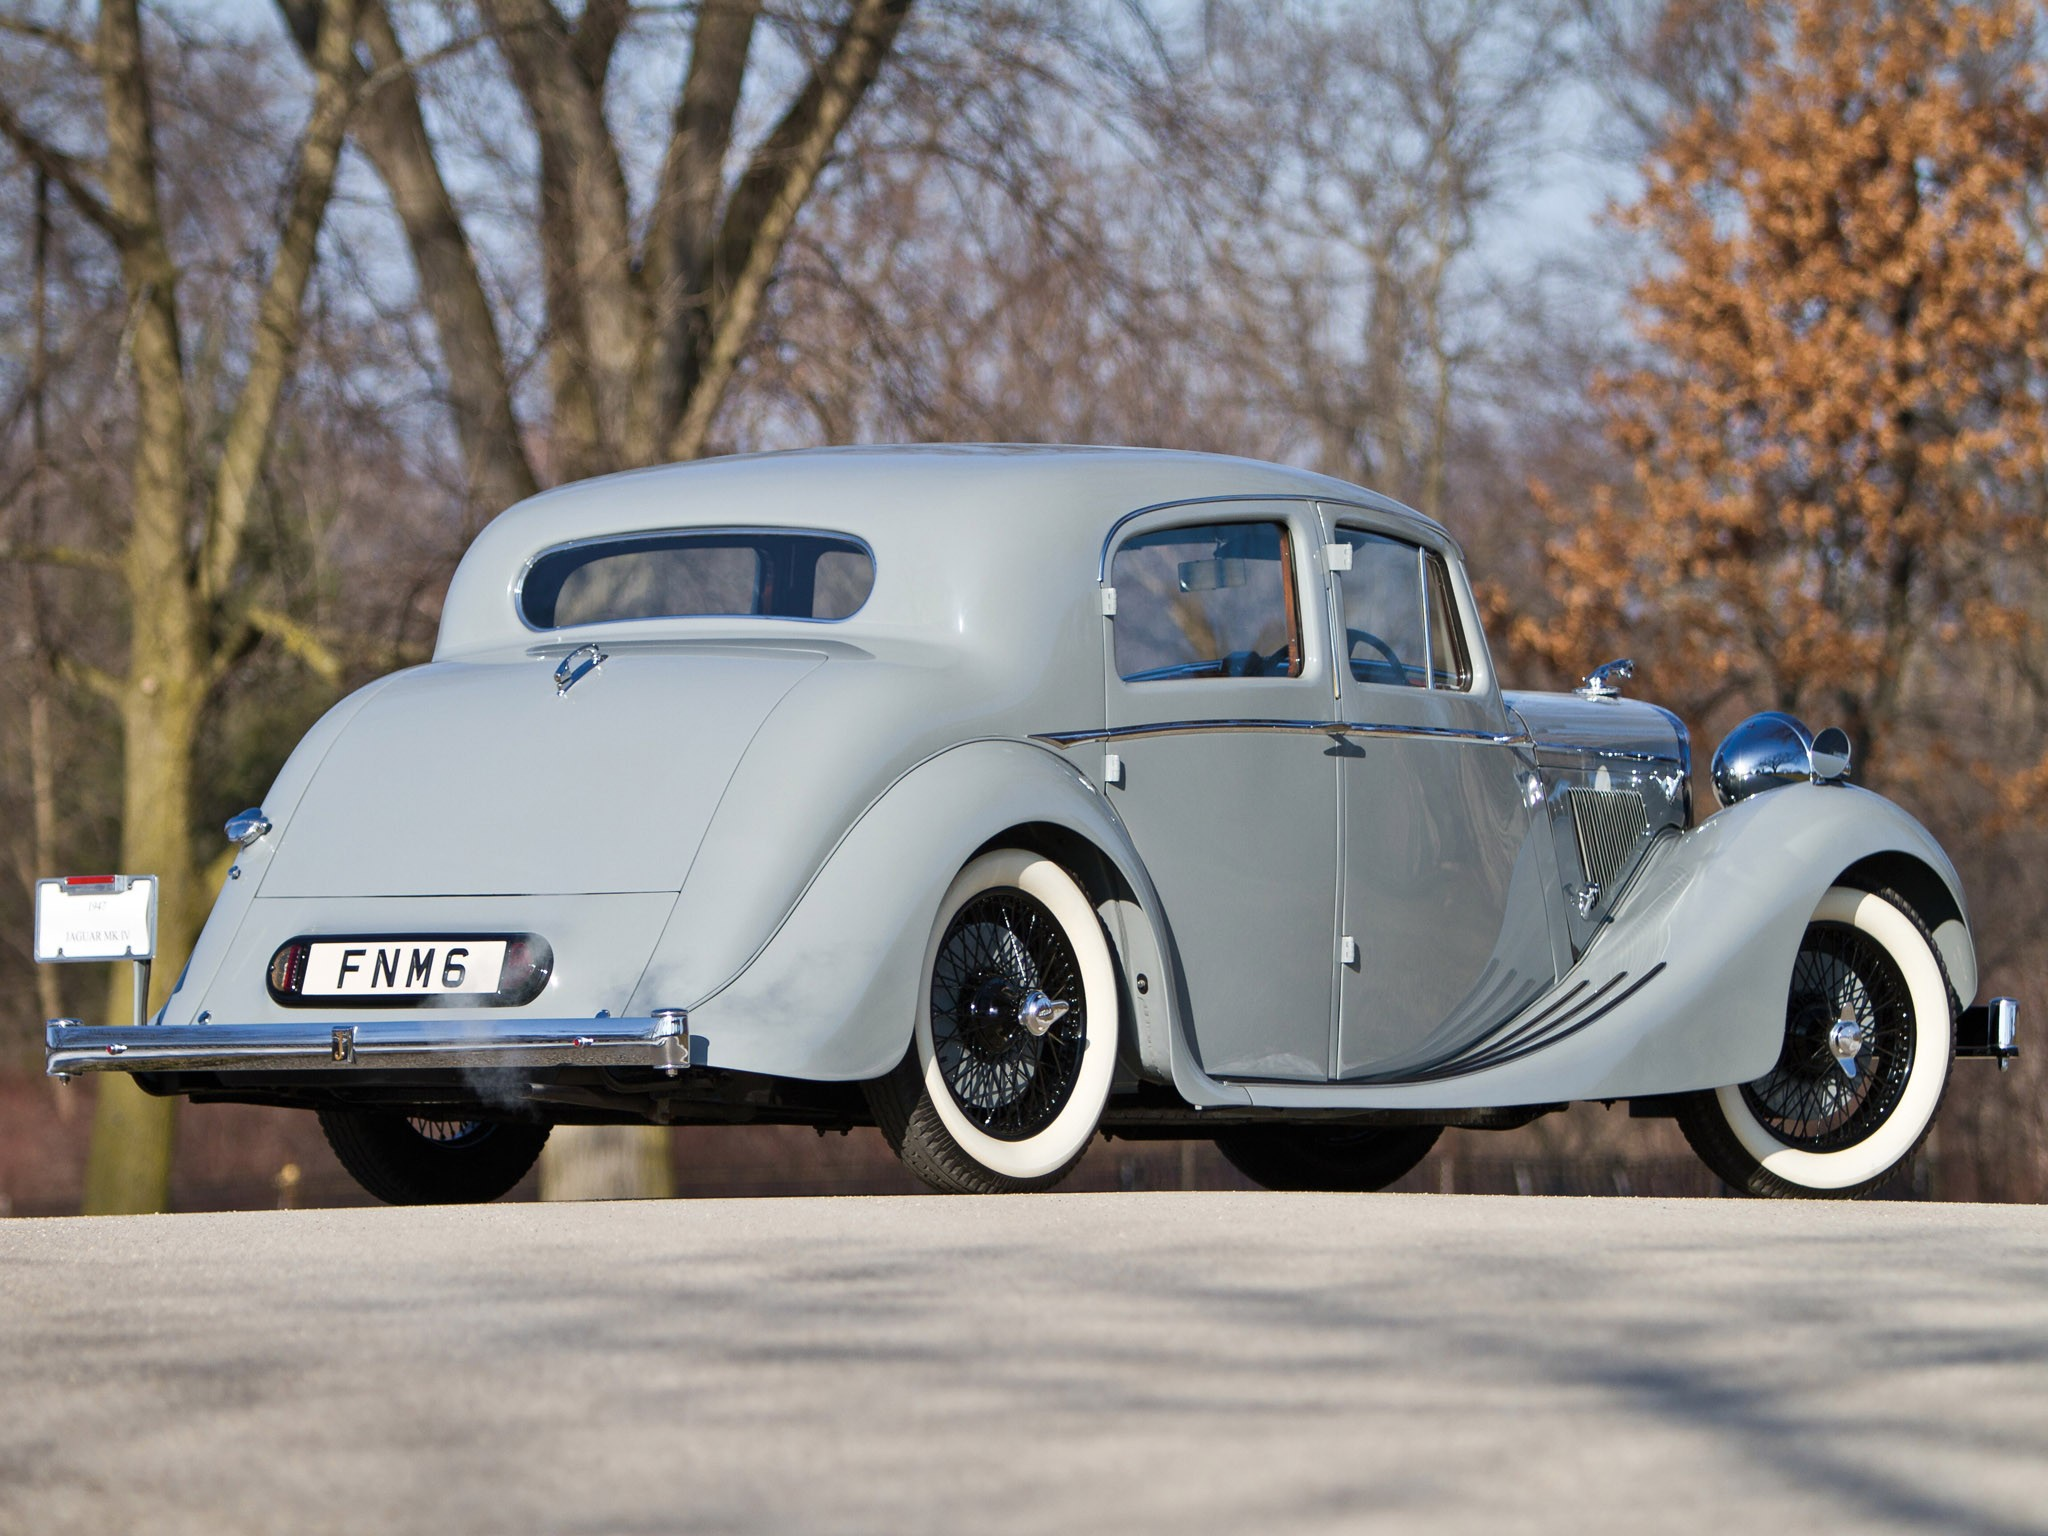 1947 Jaguar Mark IV Saloon